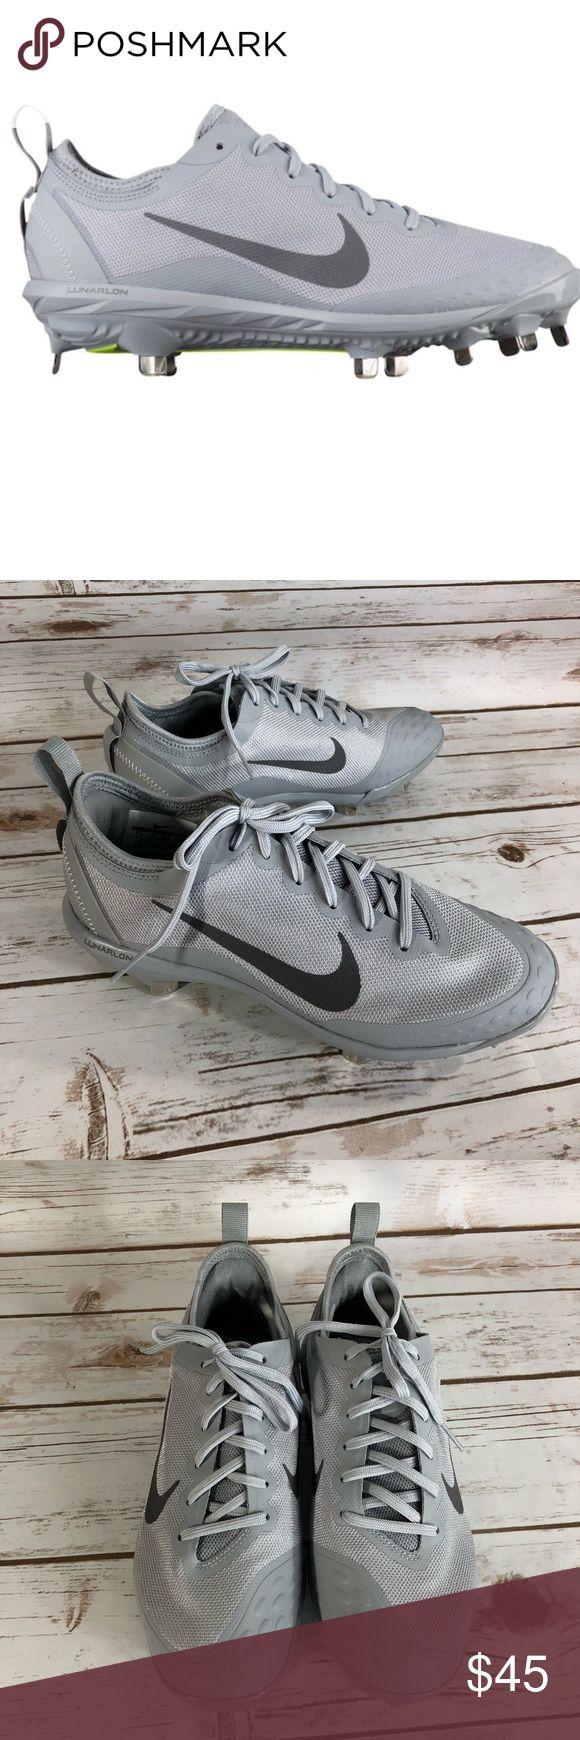 Nike Hyperdiamond Lunarlon Women's Softball Cleats New without Box Metal Cleats A333 Nike Shoes Sneakers